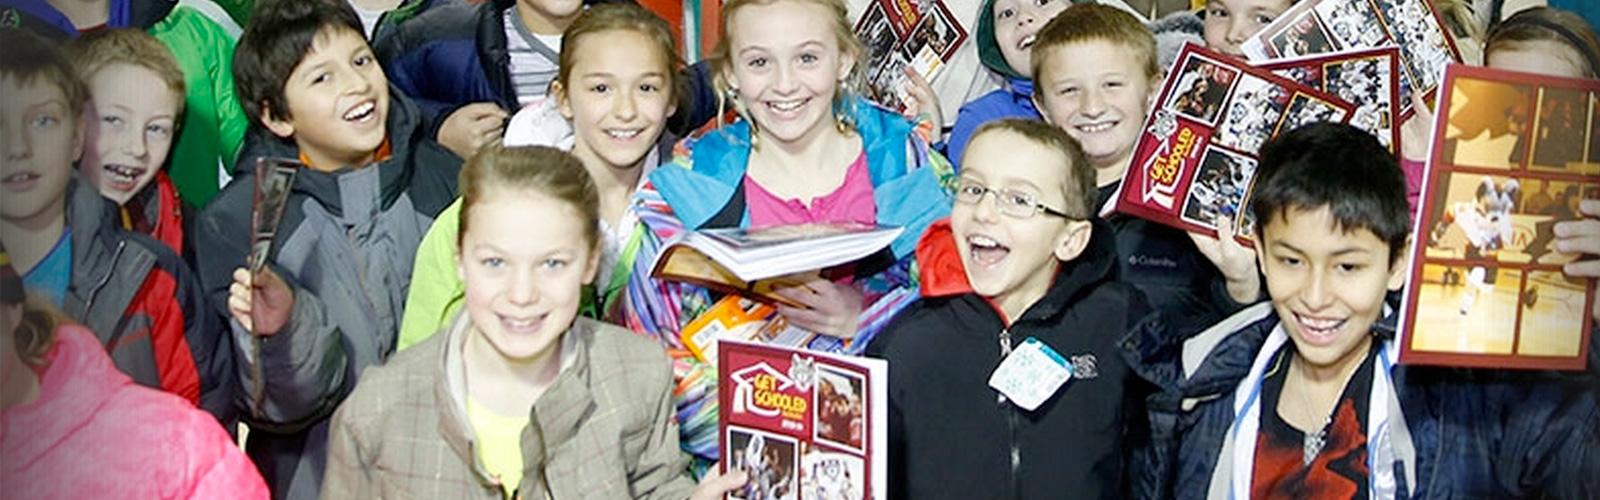 Chicago school programs